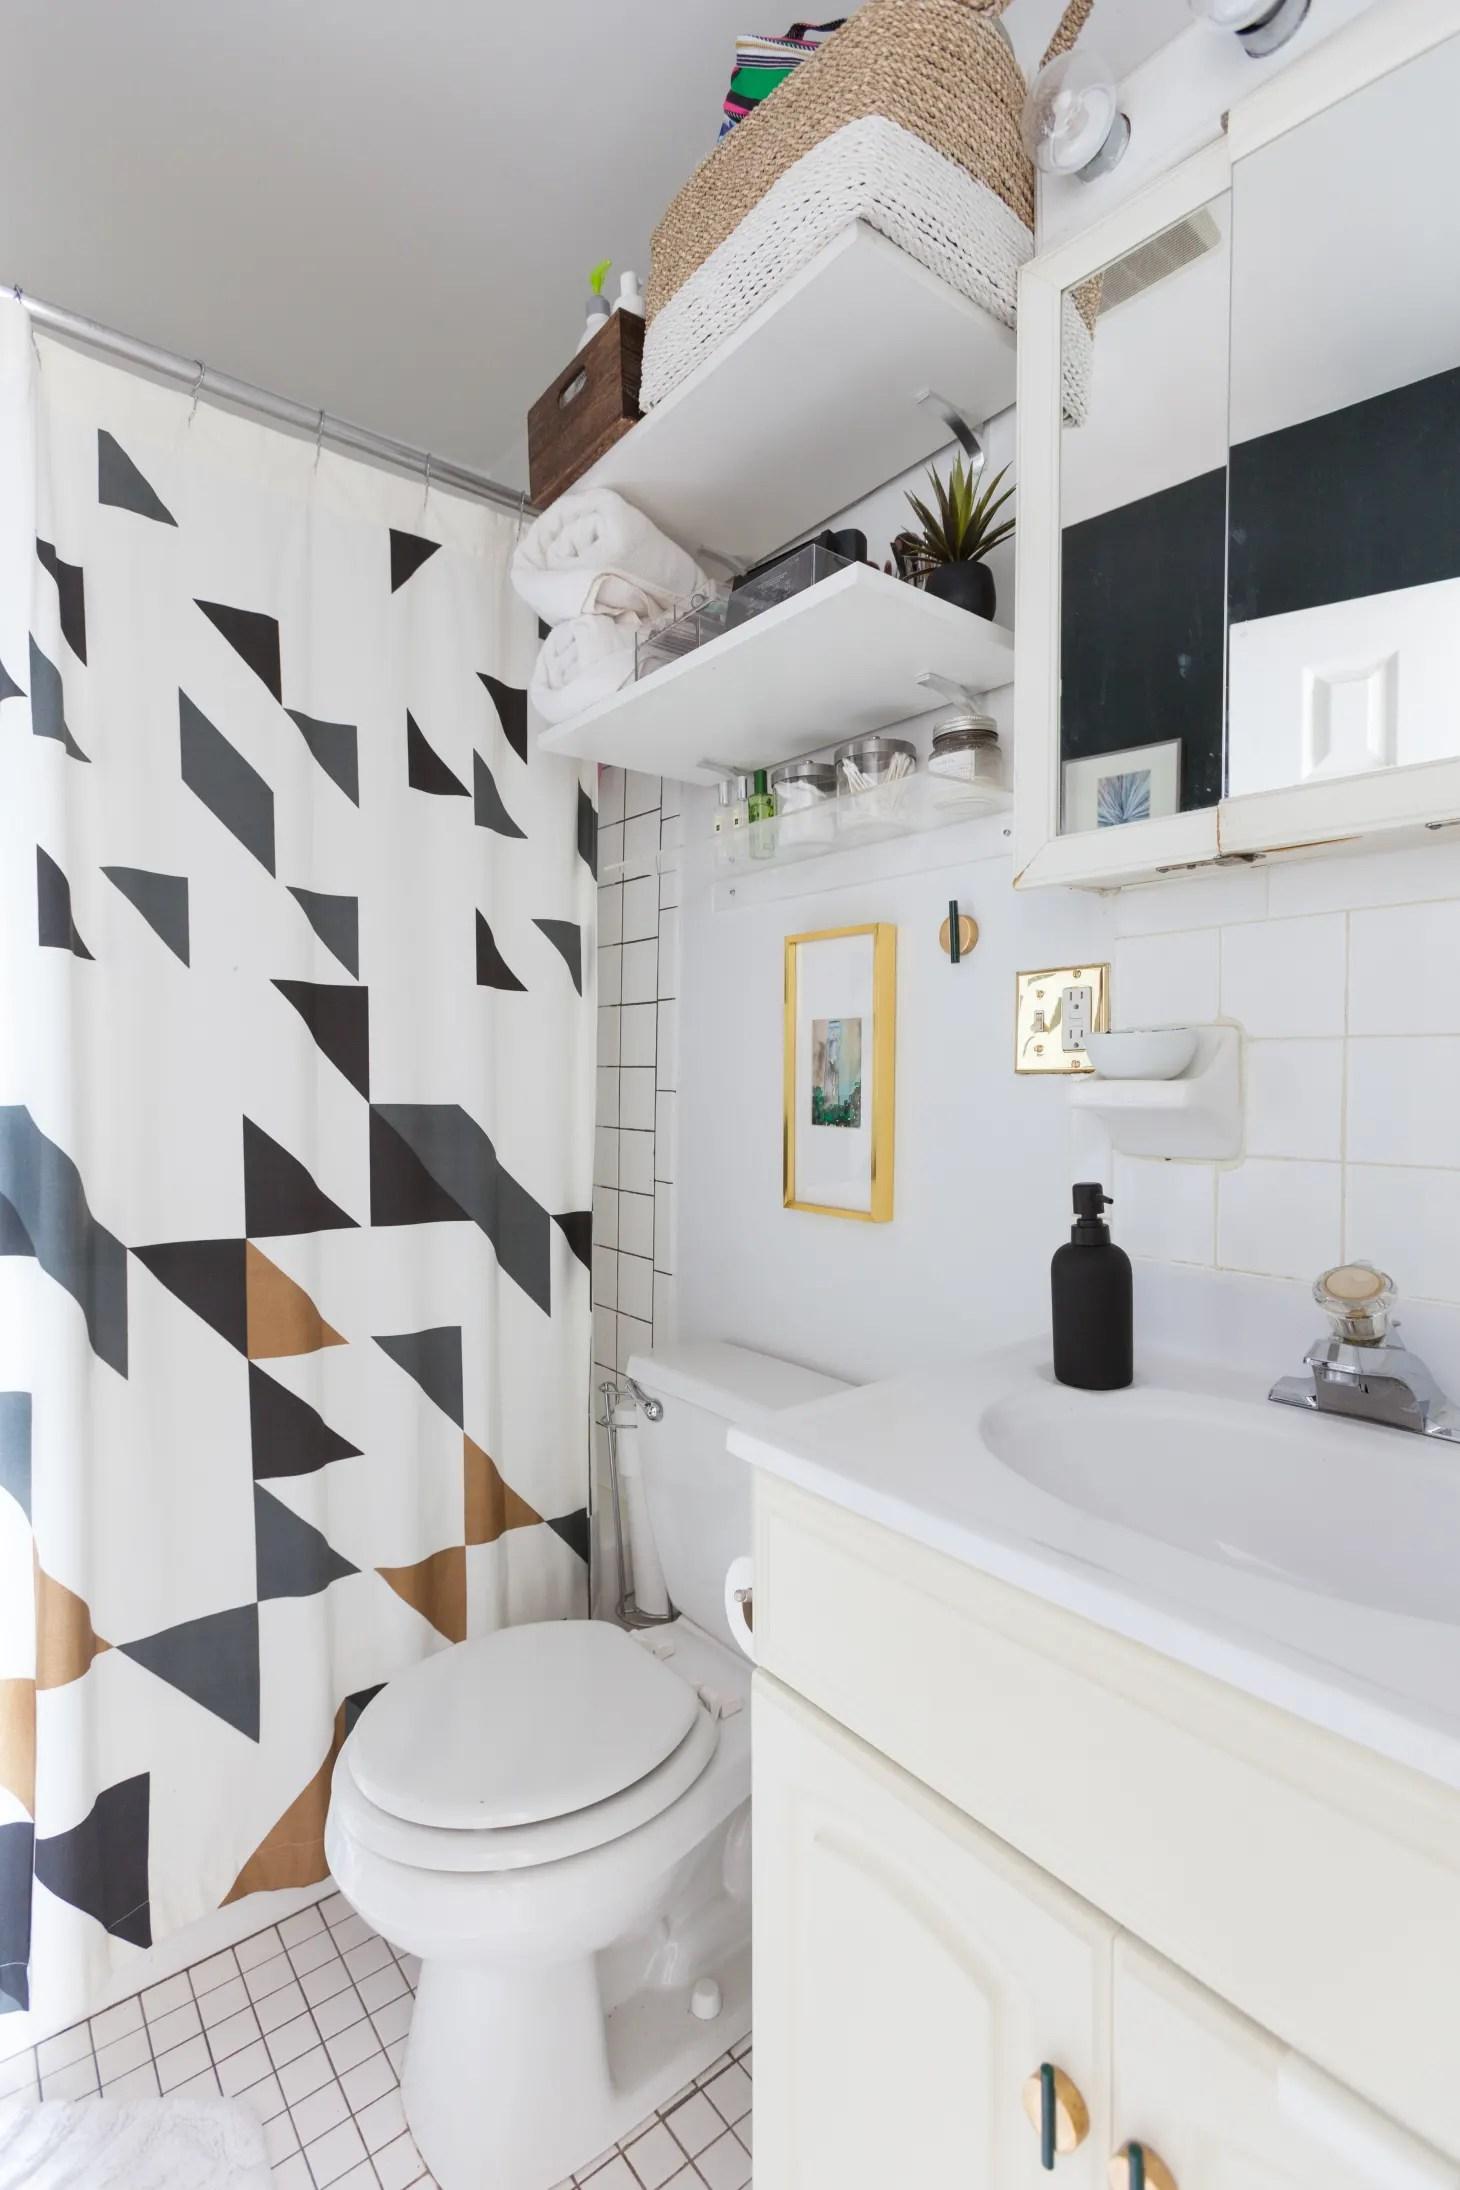 25 Small Bathroom Storage & Design Ideas - Storage ... on Bathroom Ideas Apartment  id=97211